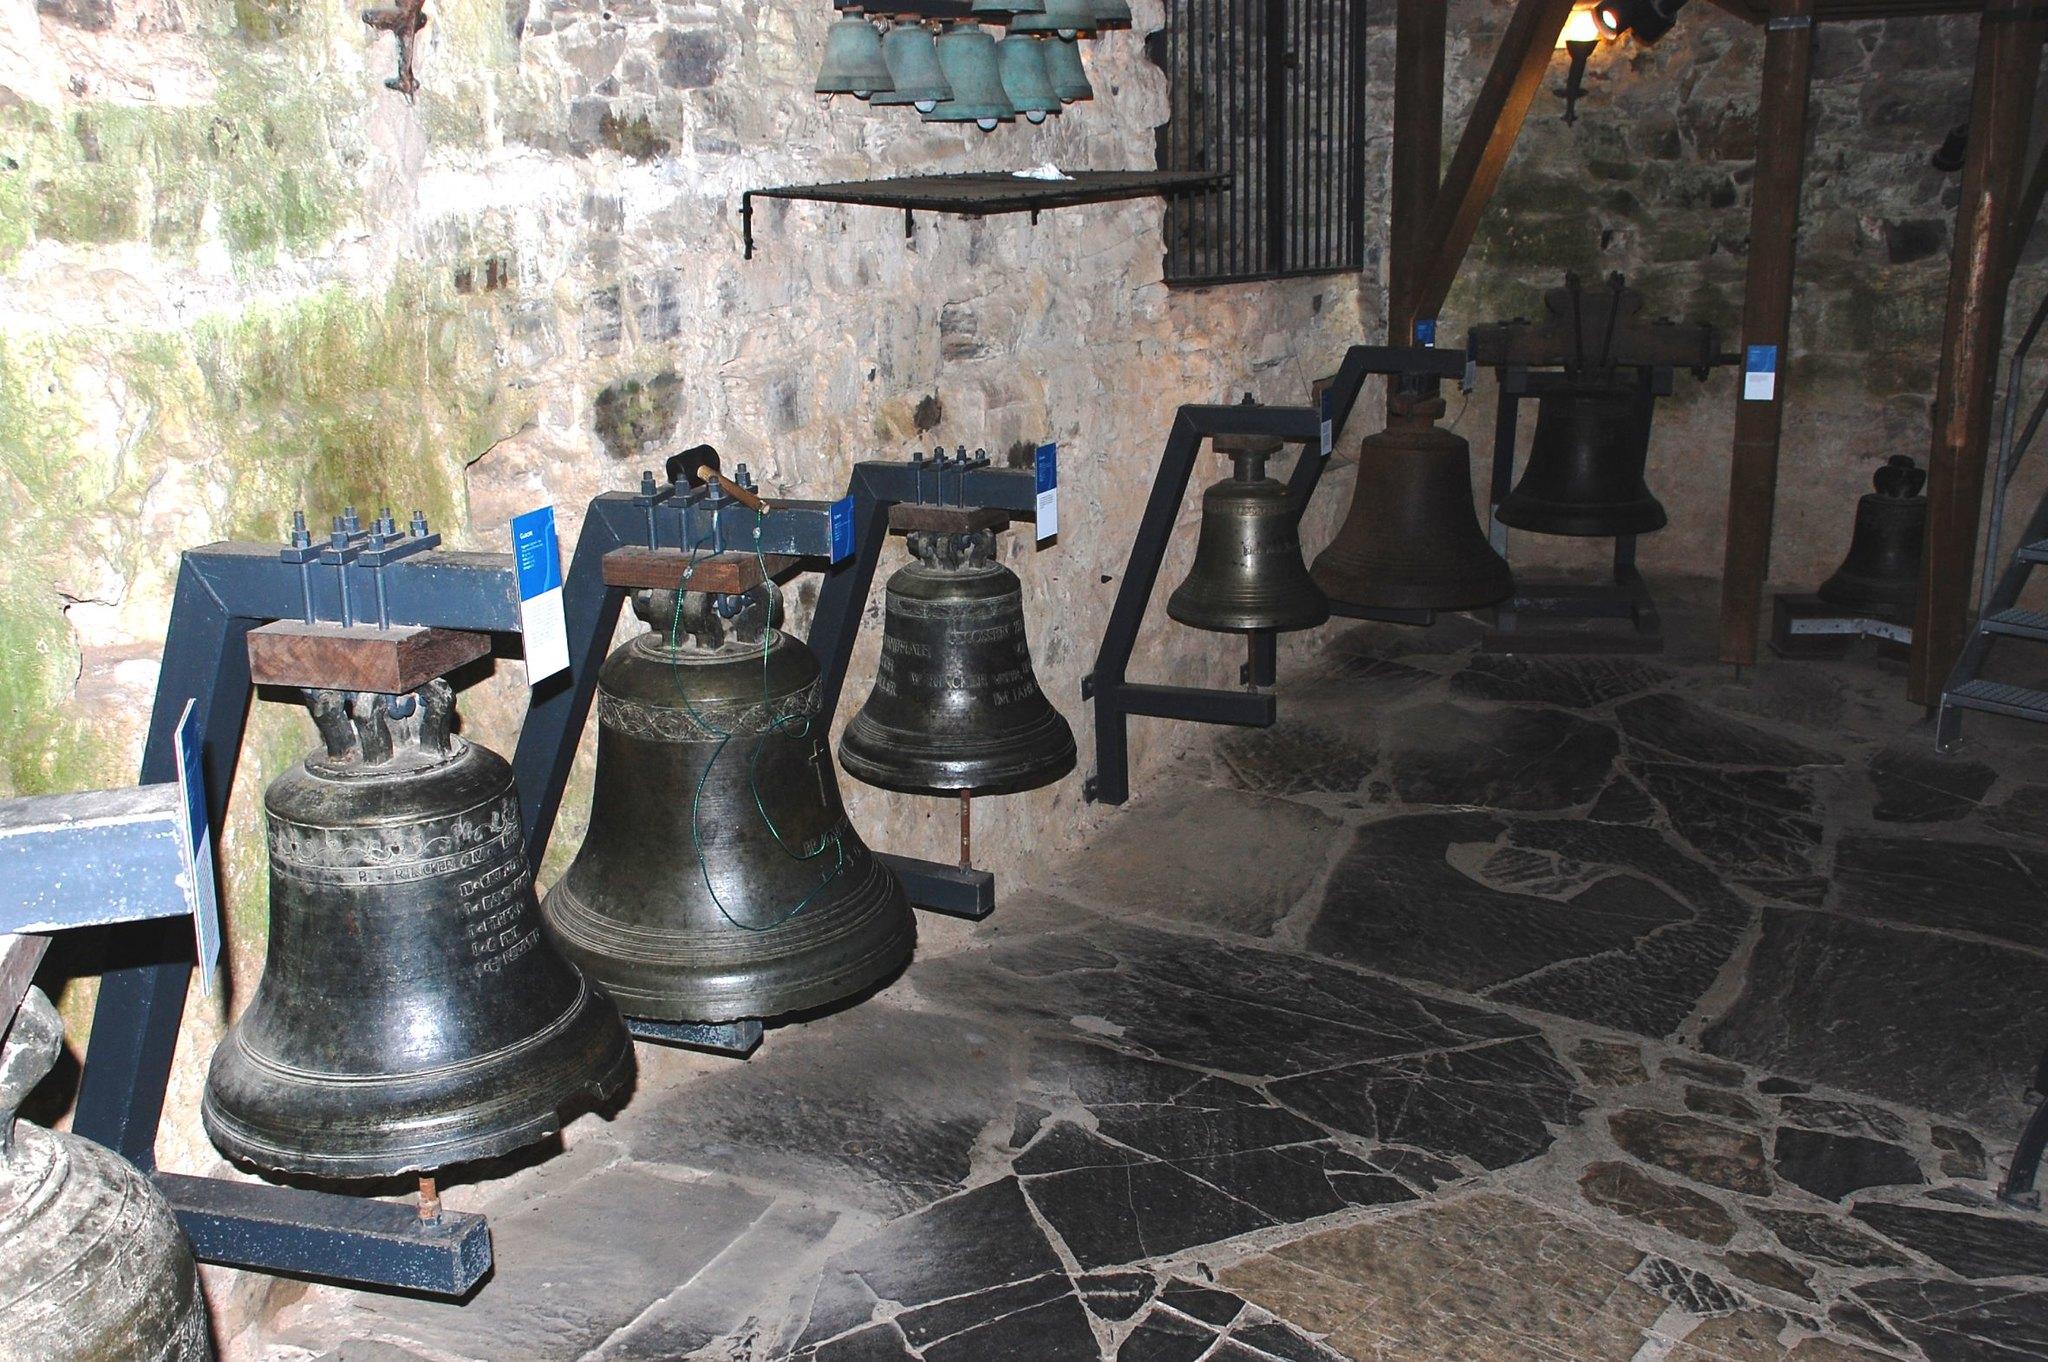 Glockenguss